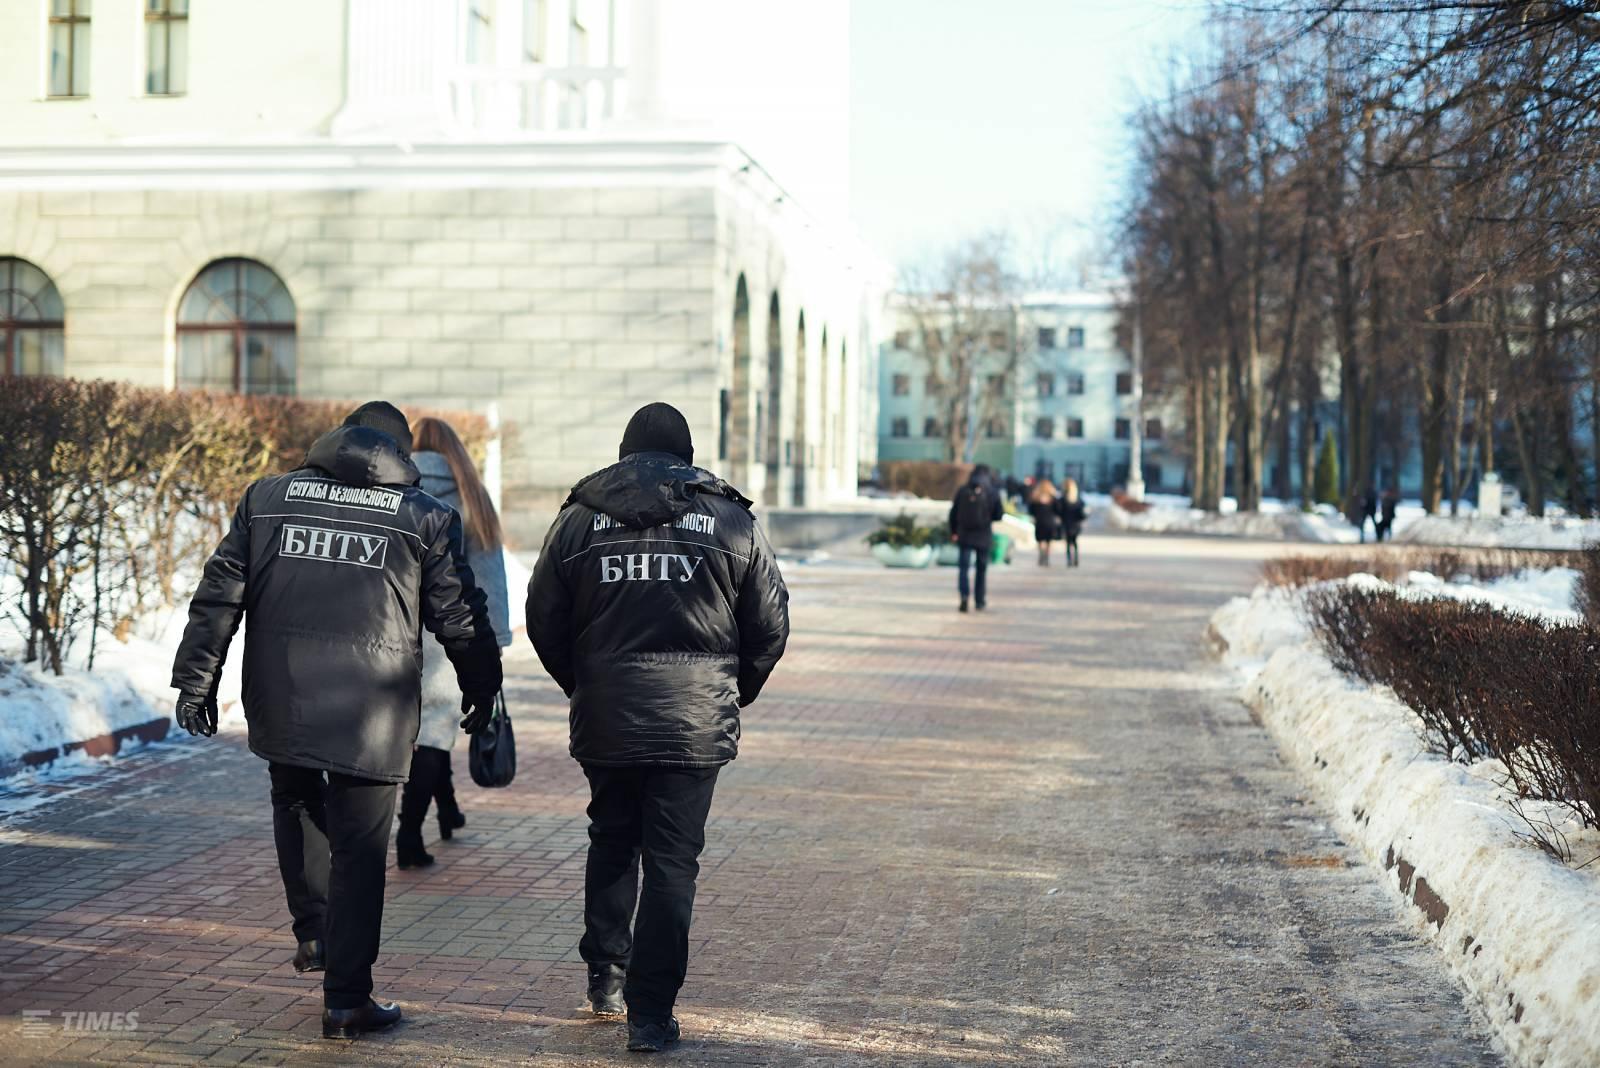 Сотрудники службы безопасности БНТУ